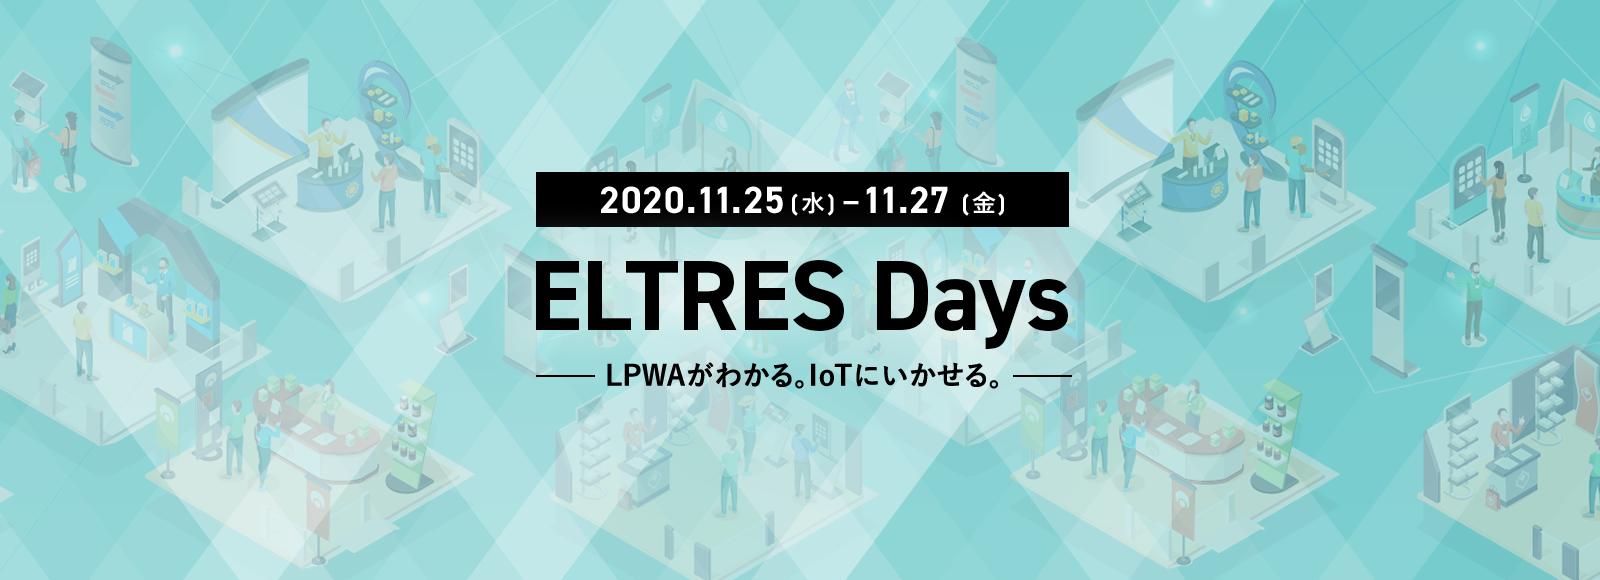 ELTRES Days KVテキスト無し - トップページ